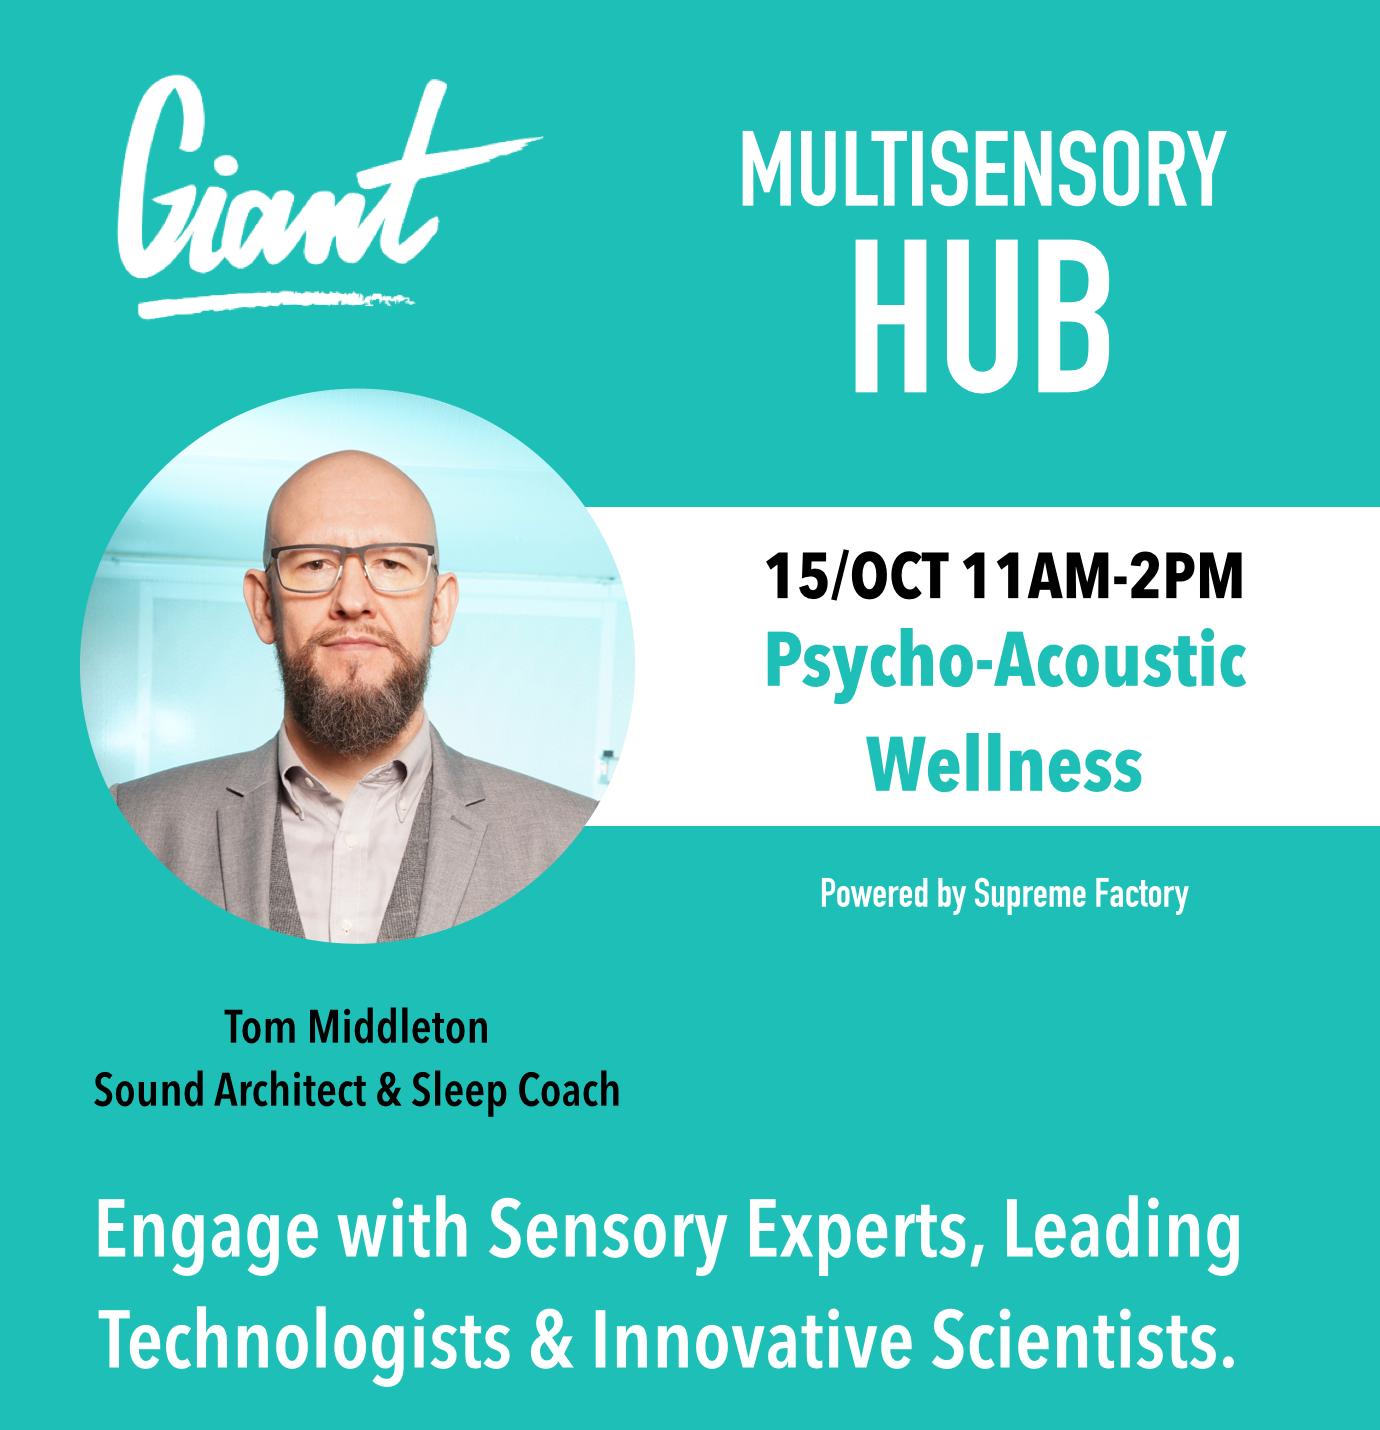 Tom Middleton, Sound Architect & Sleep Coach CEO & Founder, Sonux